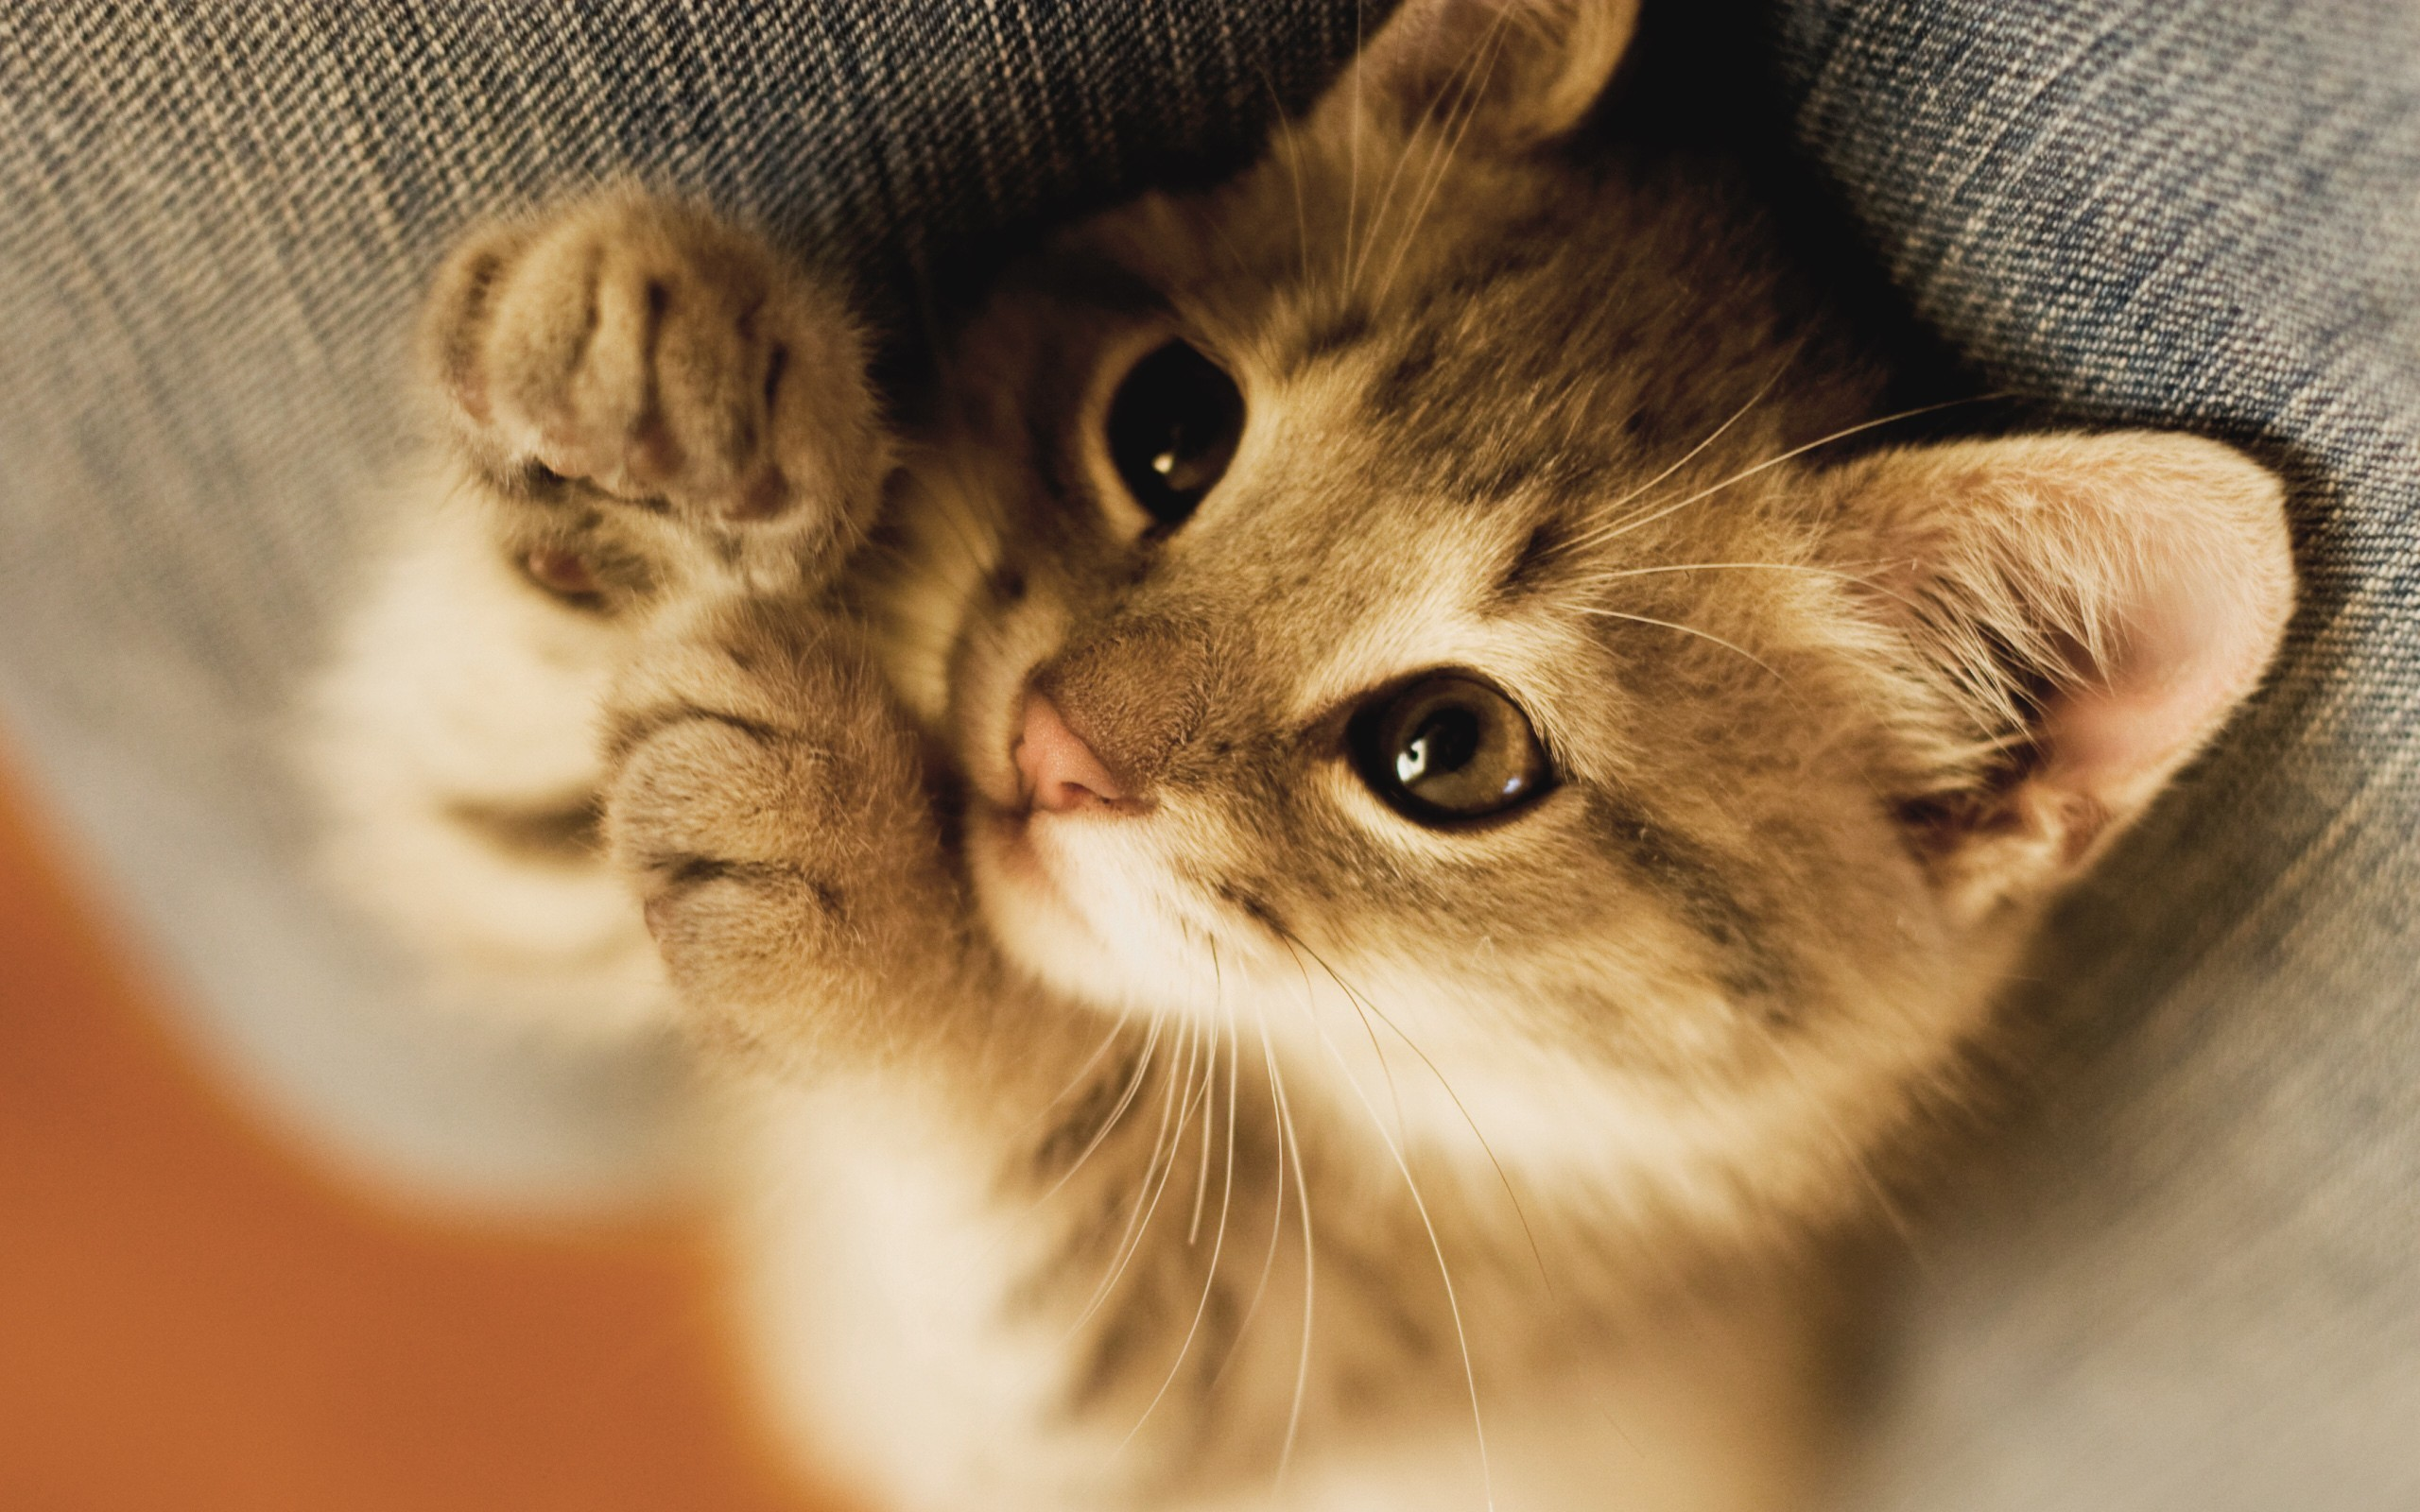 Image – Cats-and-kittens-wallpapers-hdkitten-cat-big-